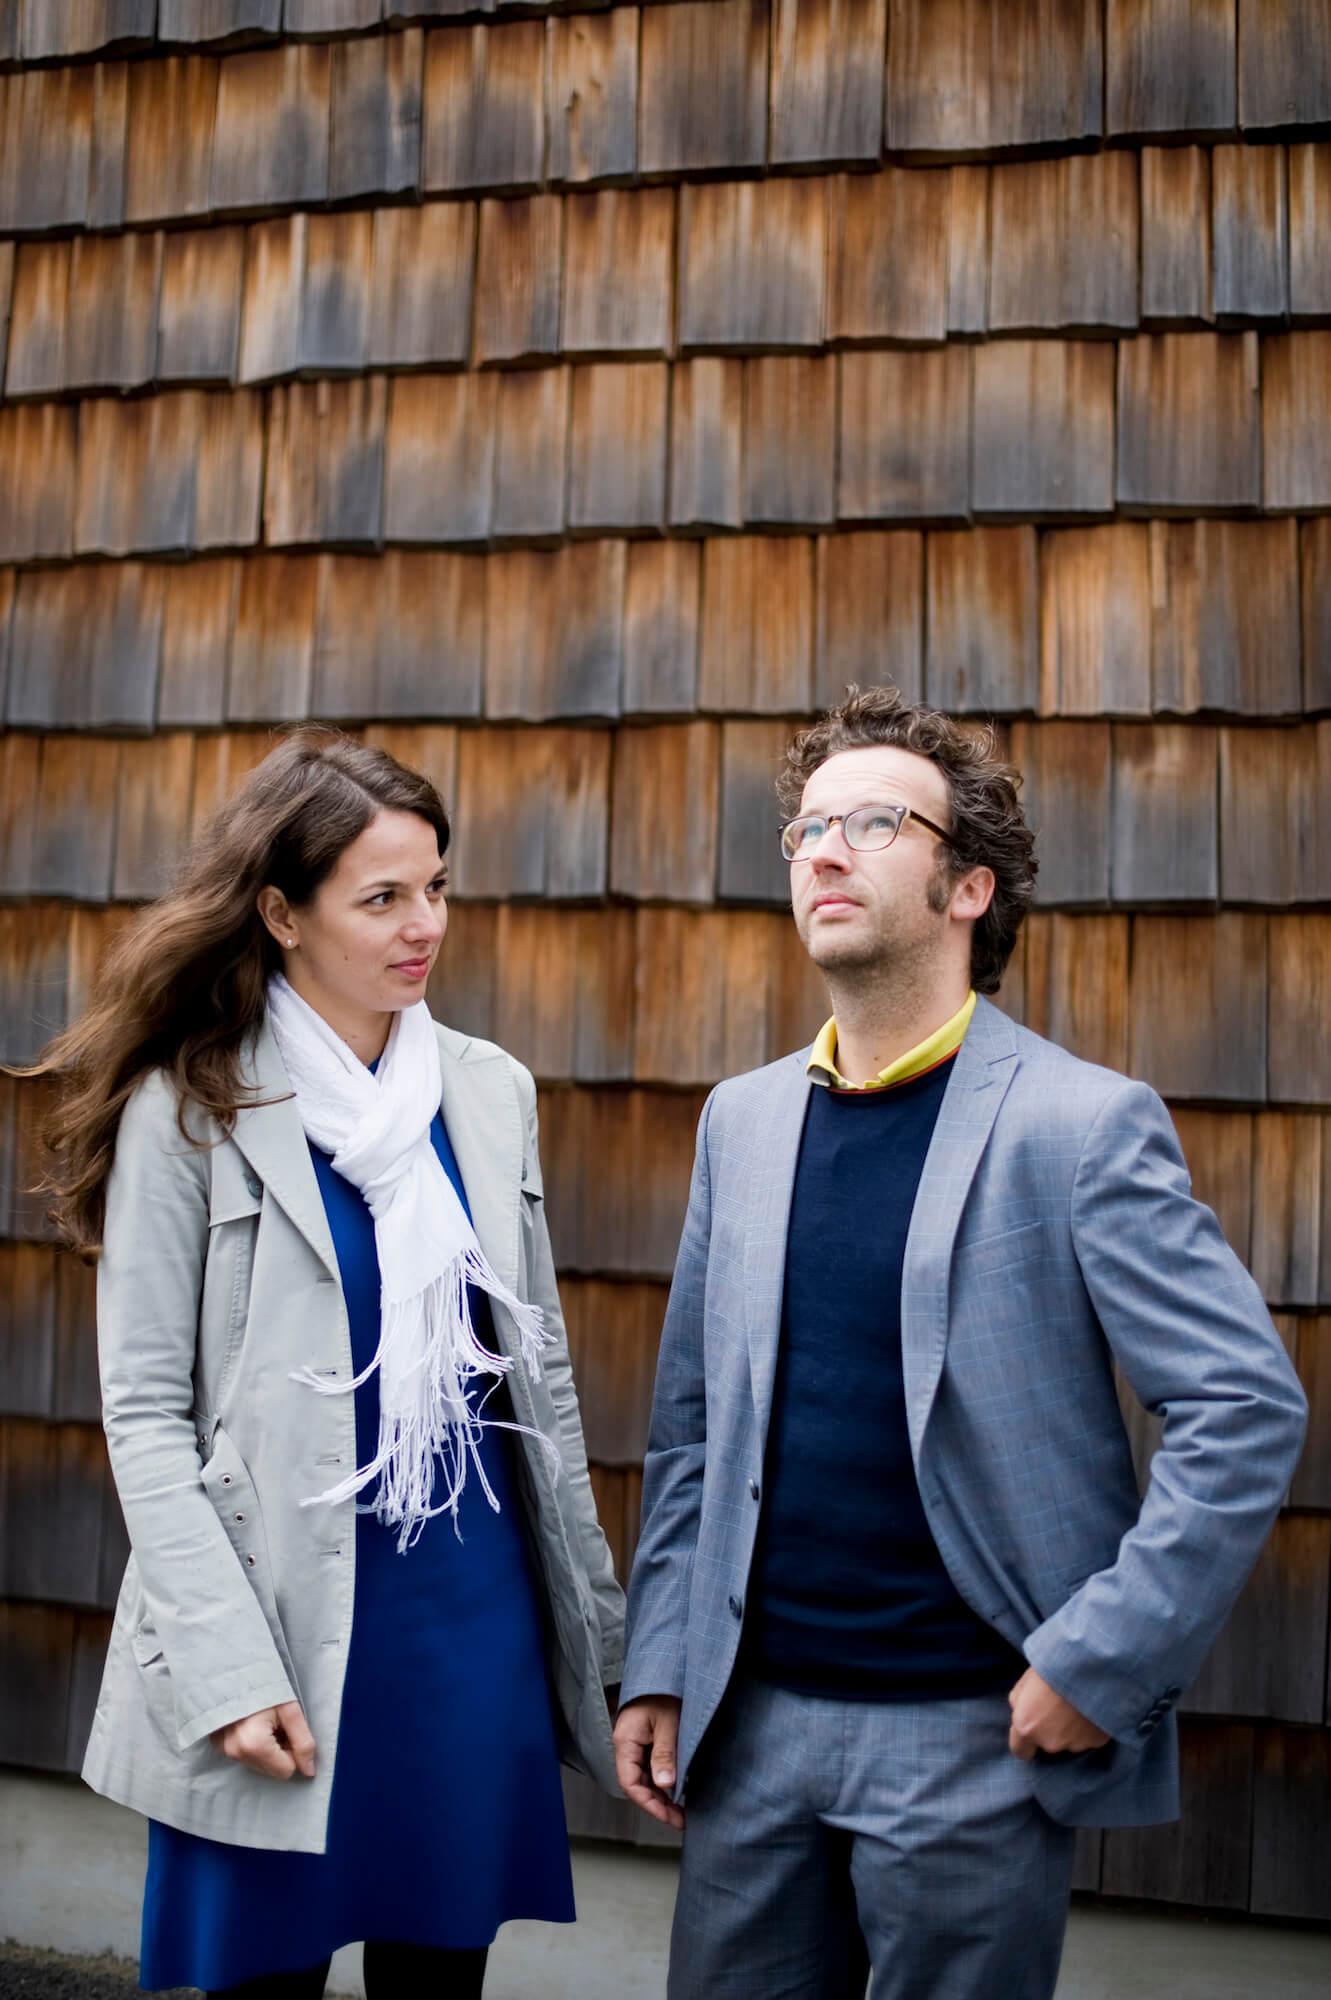 Silvia Schellenberg-Thaut & Sebastian Thaut